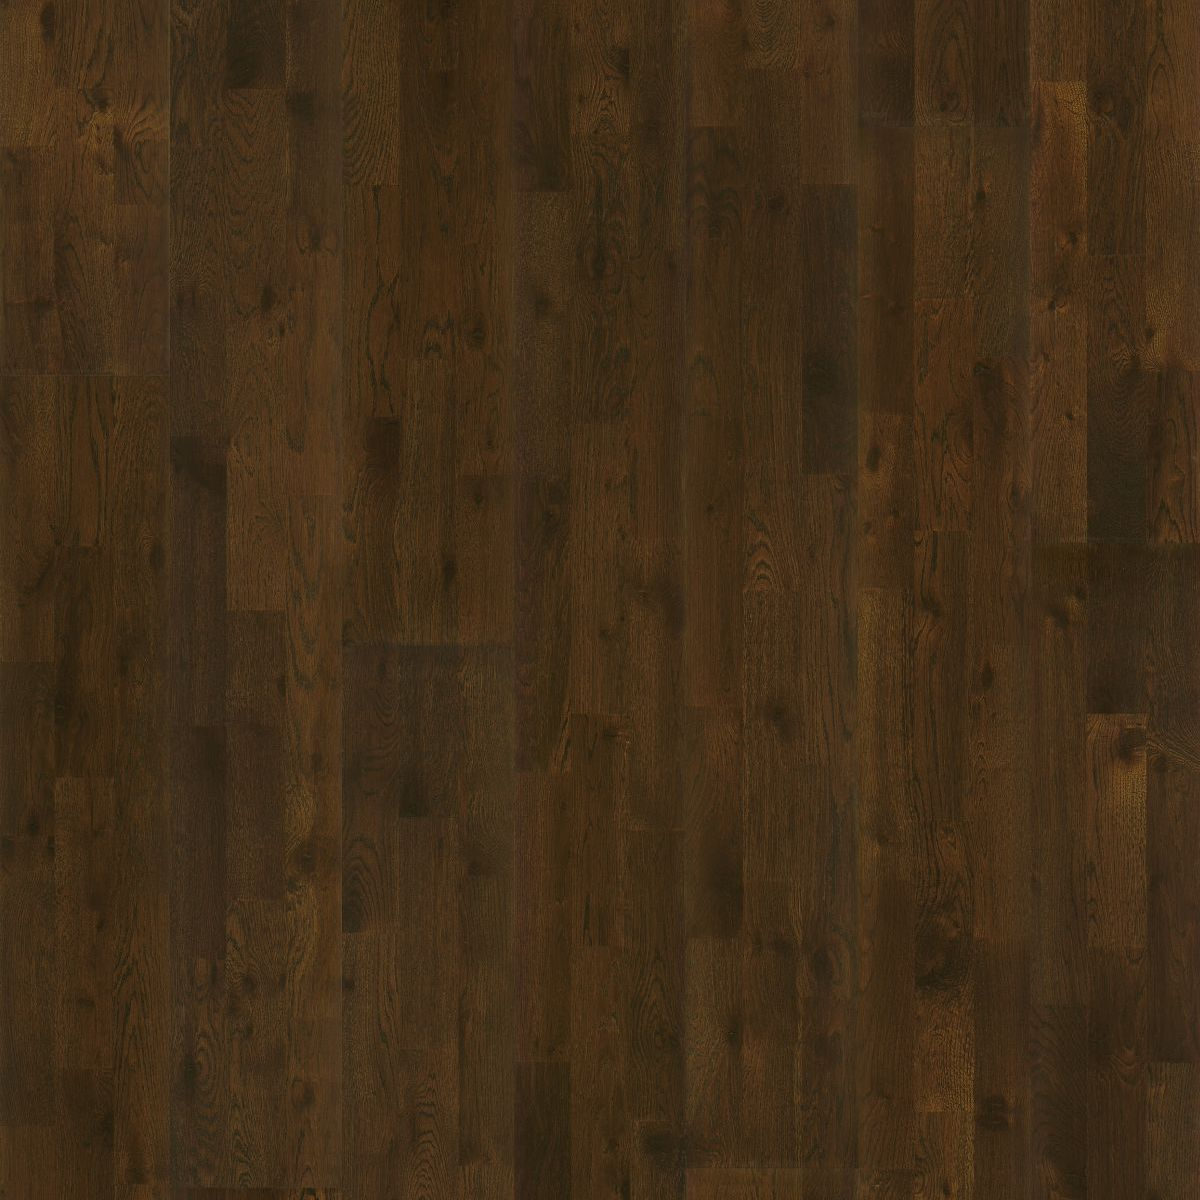 Kährs Ek Brownie 3-Stav Mattlack - Parkettgolv